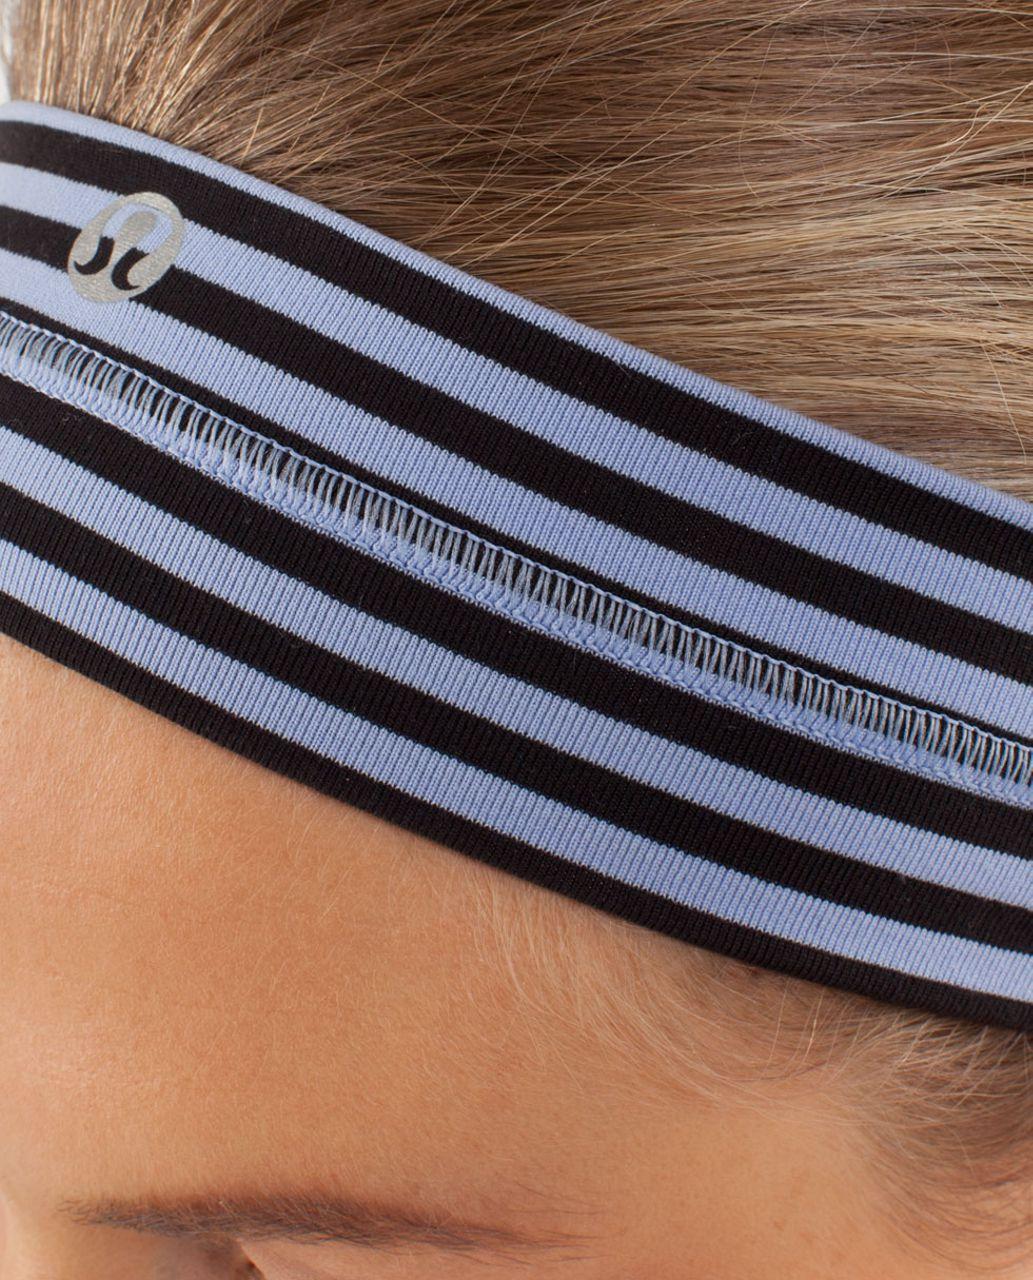 Lululemon Fly Away Tamer Headband - Classic Stripe Polar Haze Black